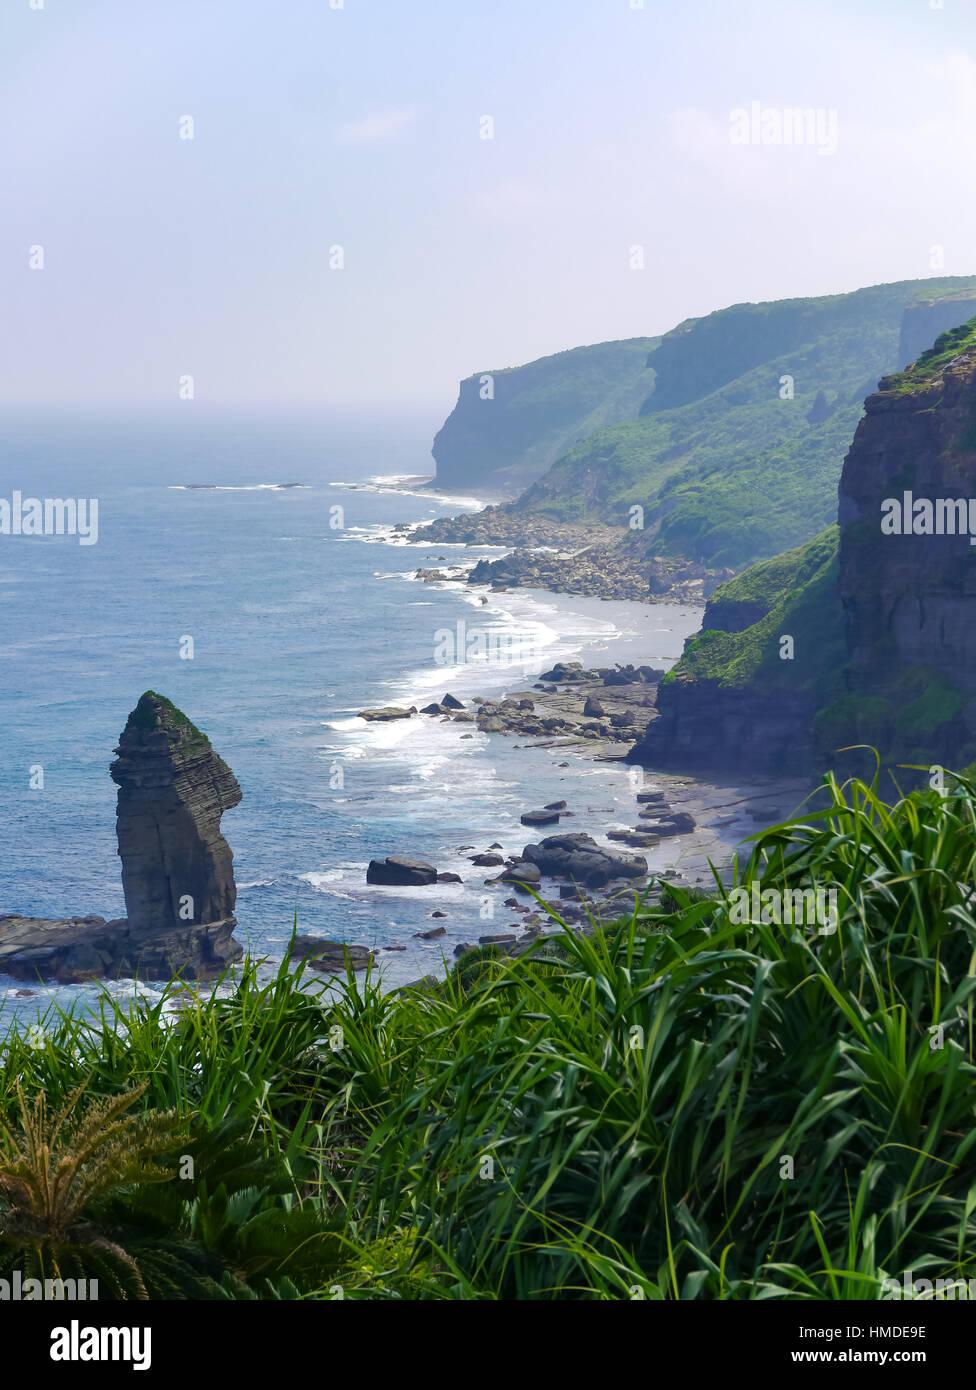 Tategami Iwa (Tategami Rock) in Yonaguni Island, western border island of Japan. Yonaguni Island a part of Okinawa. - Stock Image